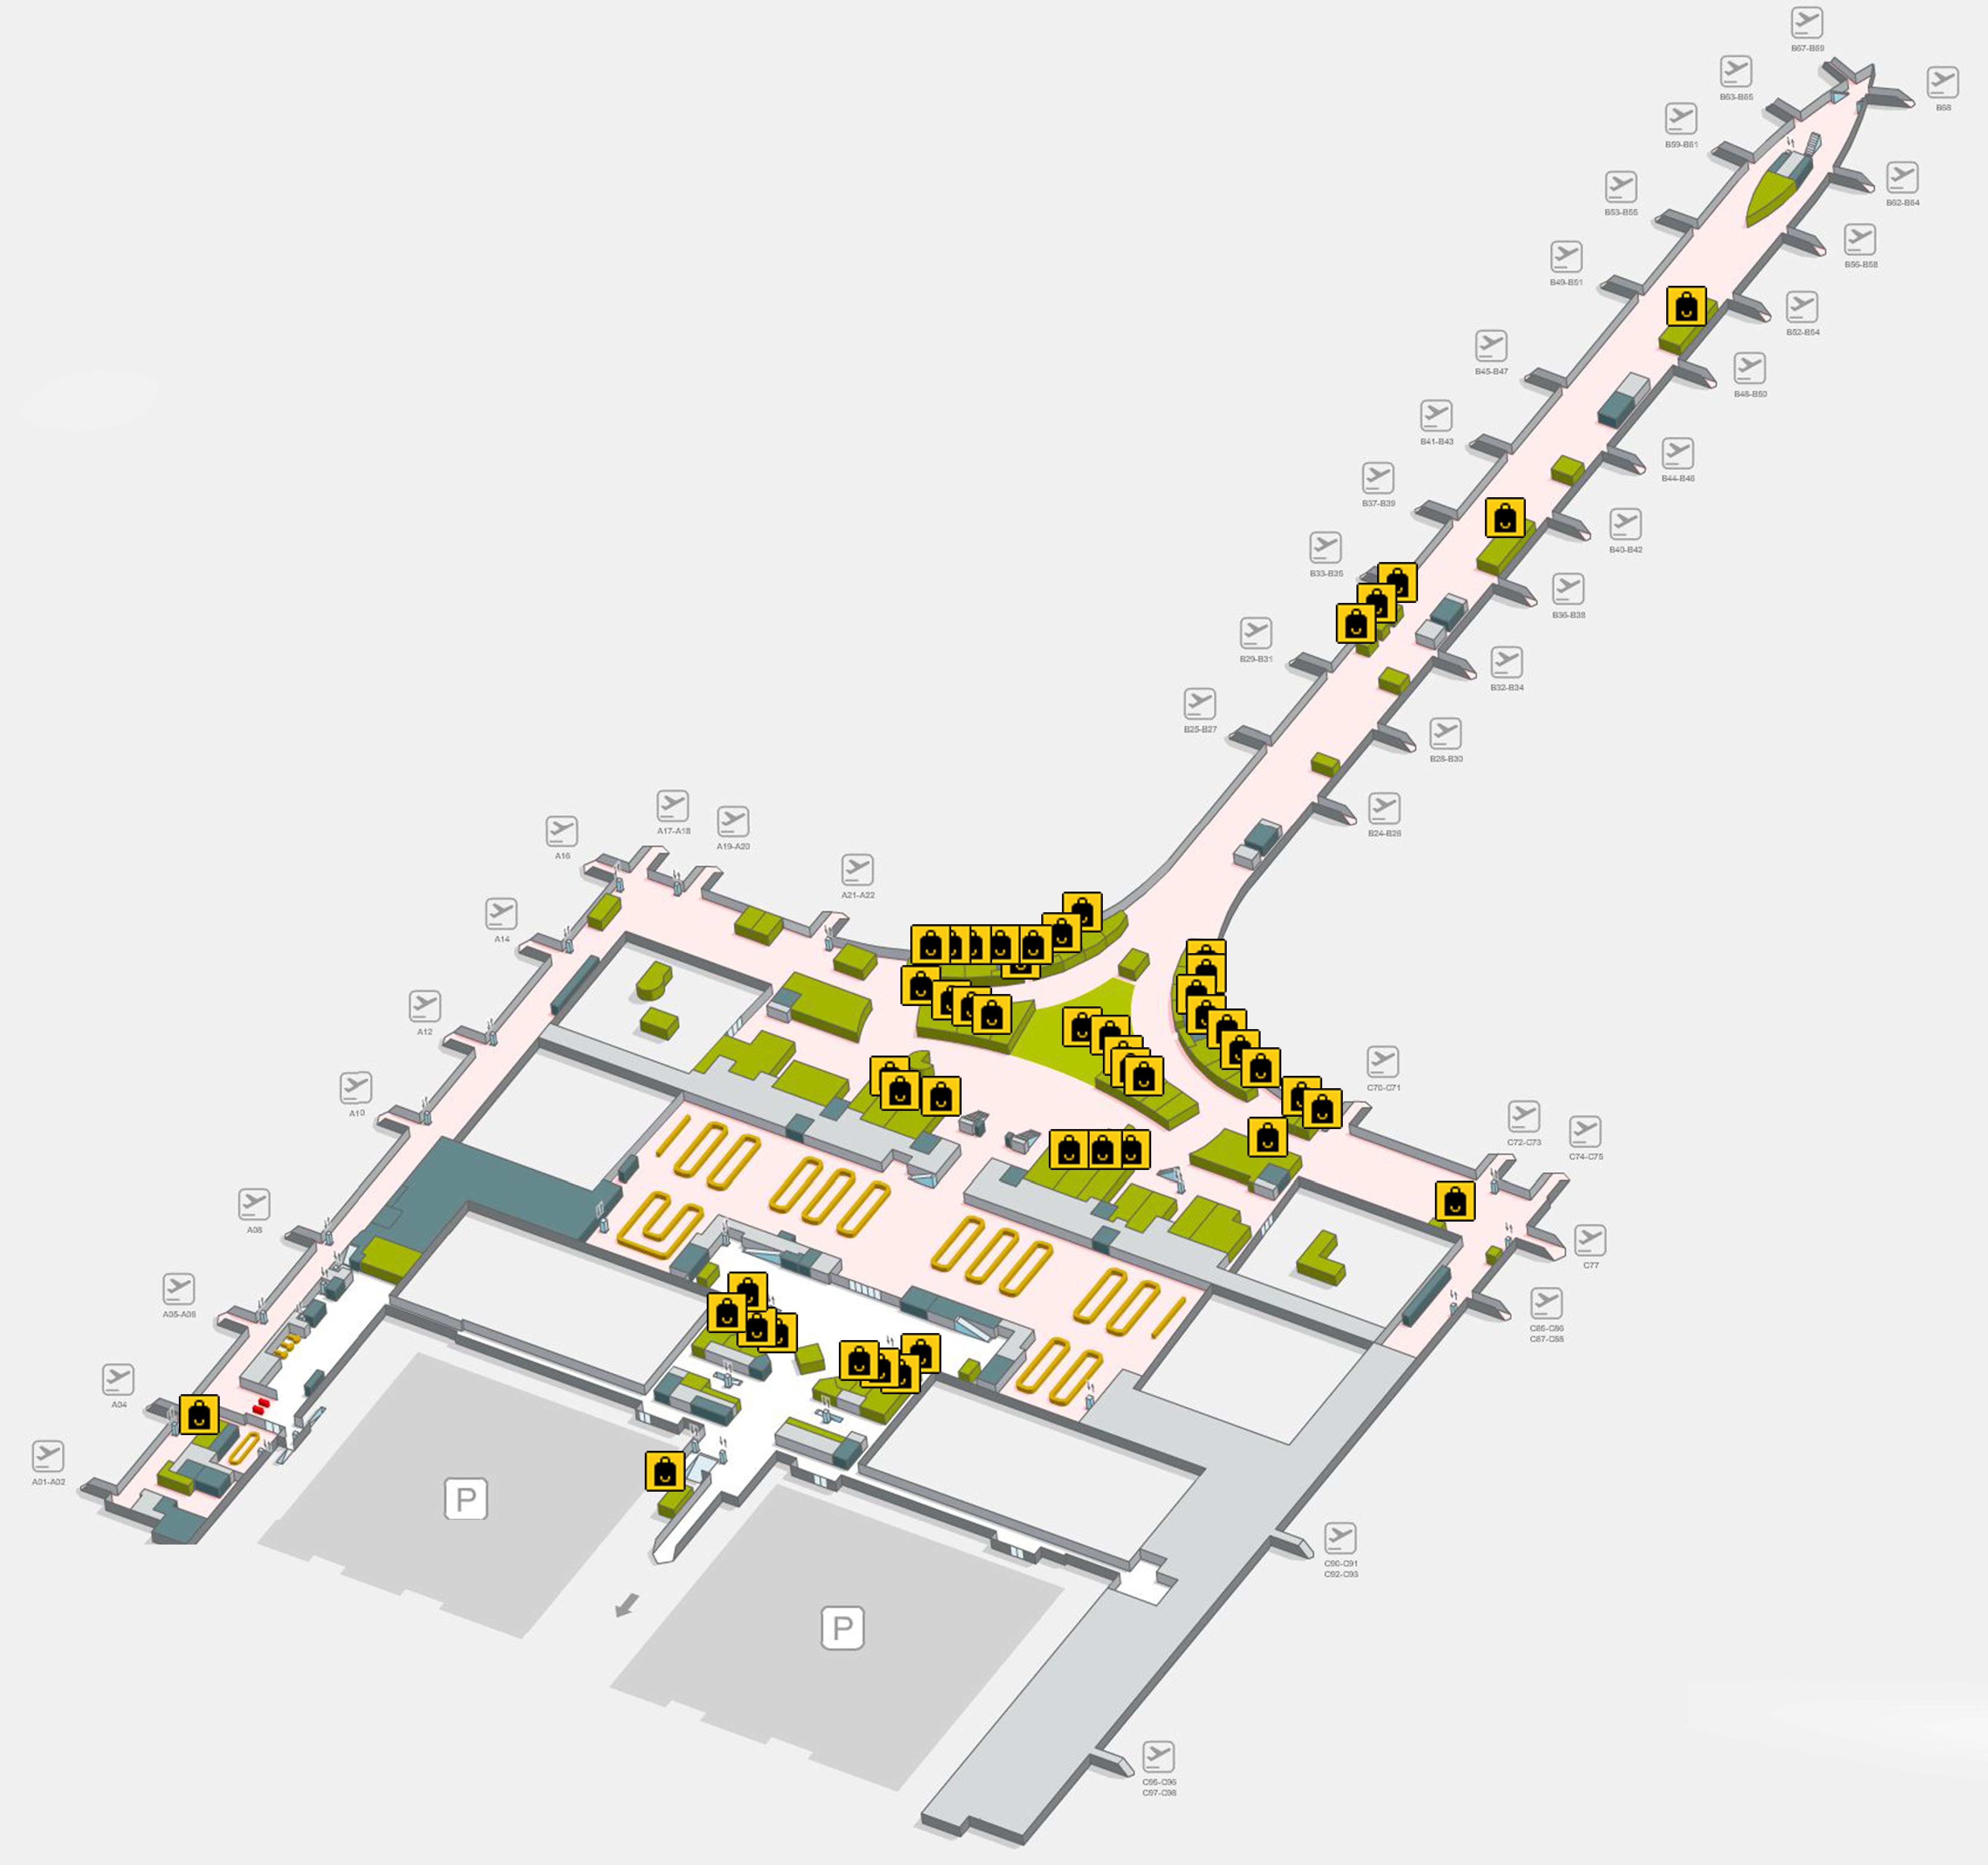 Mapa Terminal 1 Barcelona.Barcelona Airport Map Bcn Printable Terminal Maps Shops